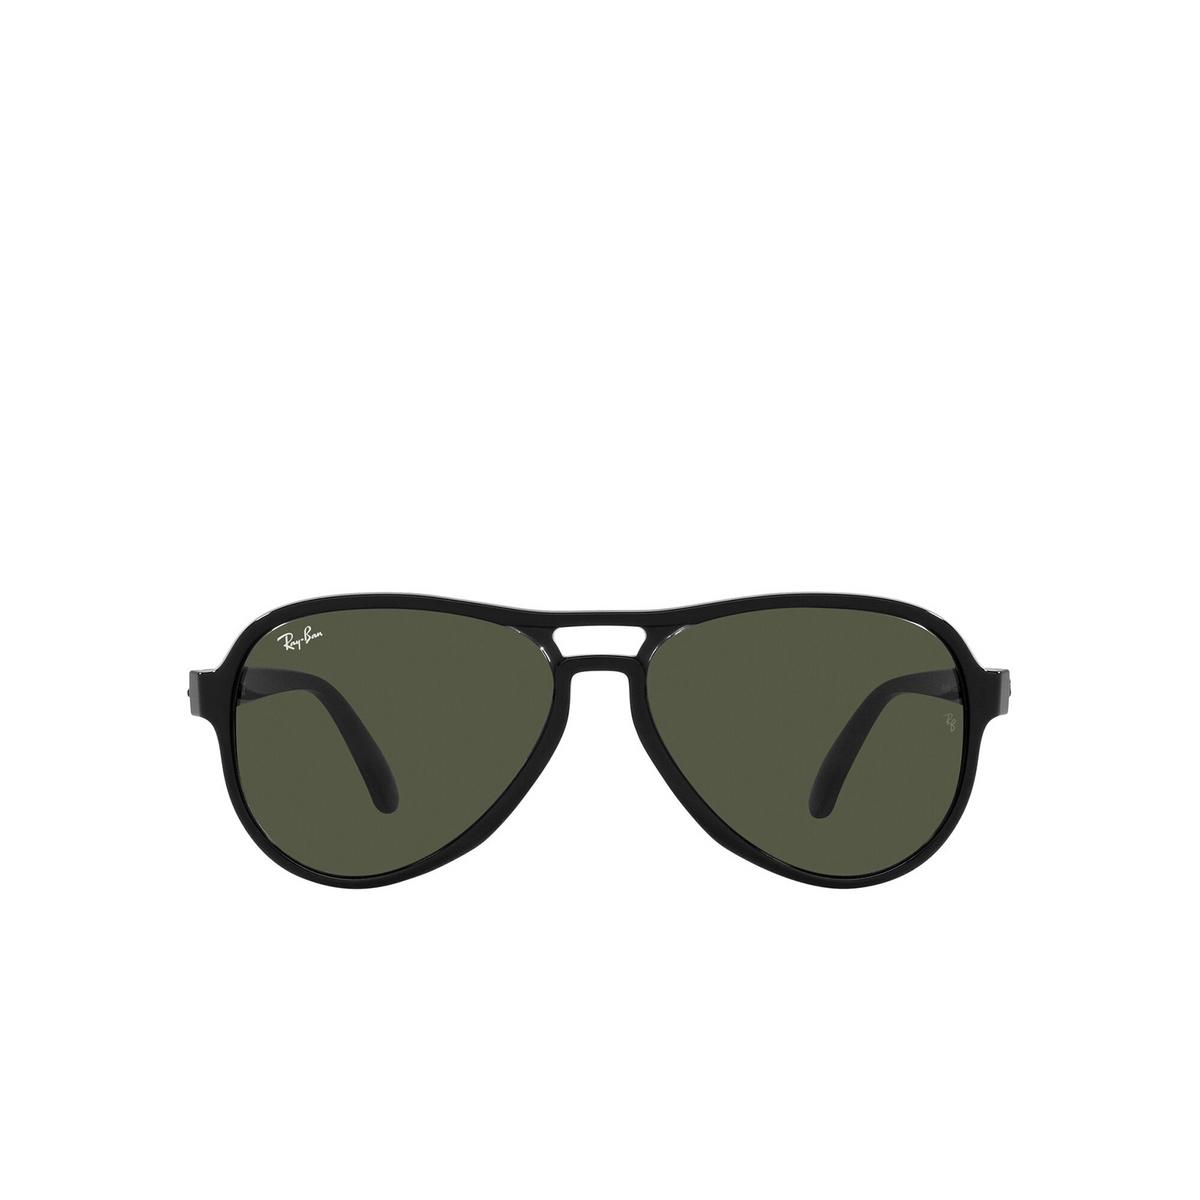 Ray-Ban® Aviator Sunglasses: Vagabond RB4355 color Black Transparent 654531 - front view.